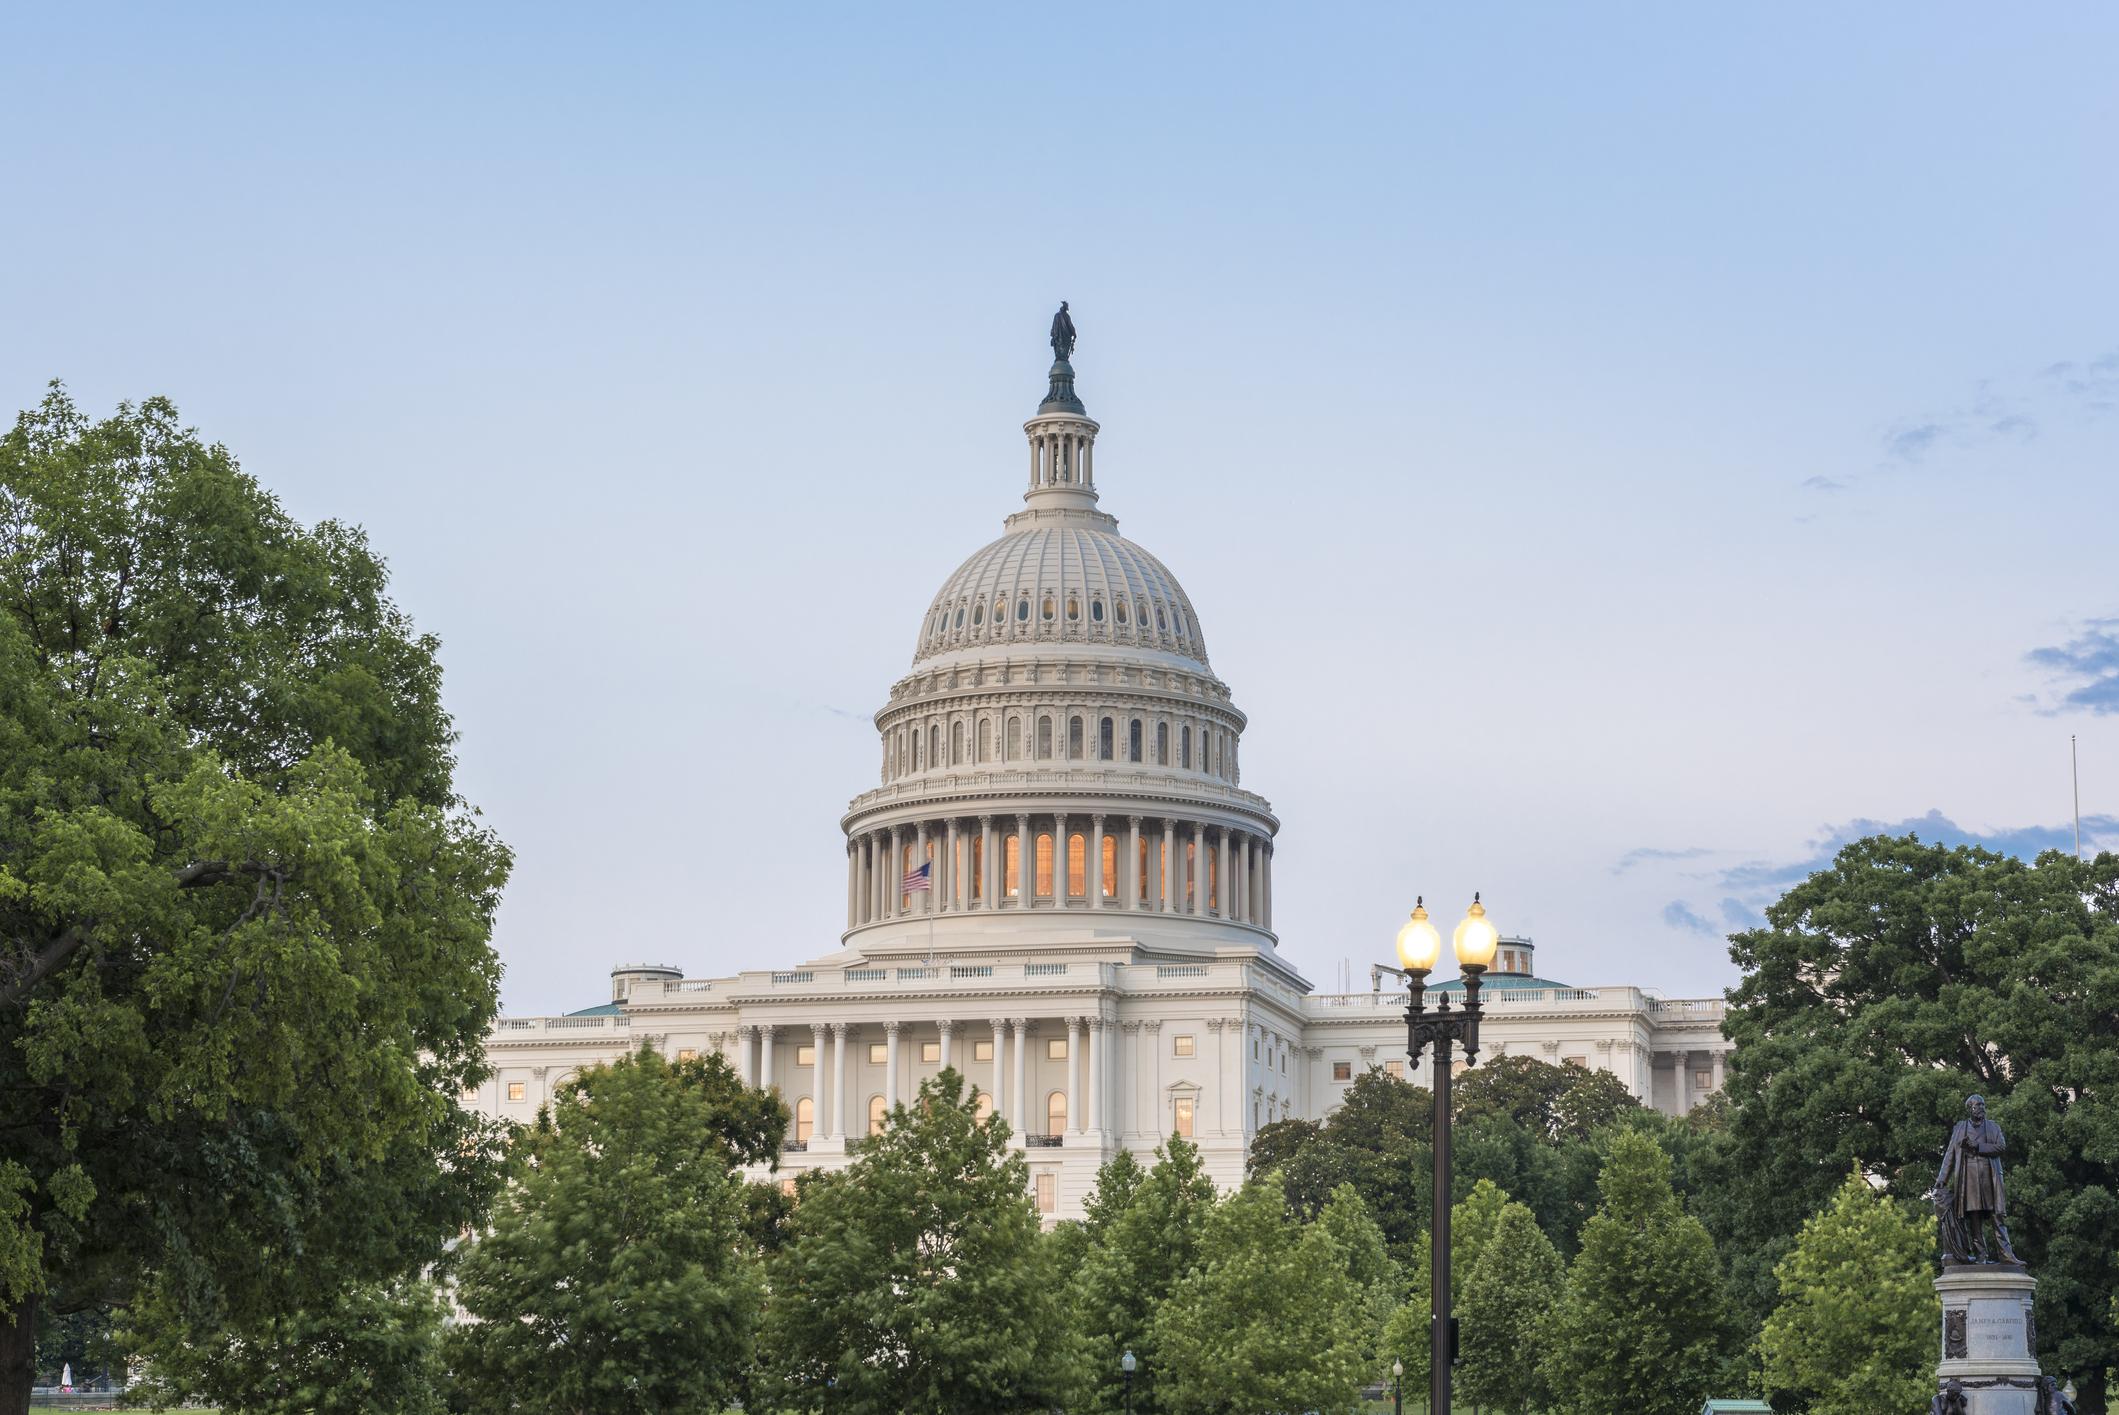 U.S. Capitol building in Washington DC.